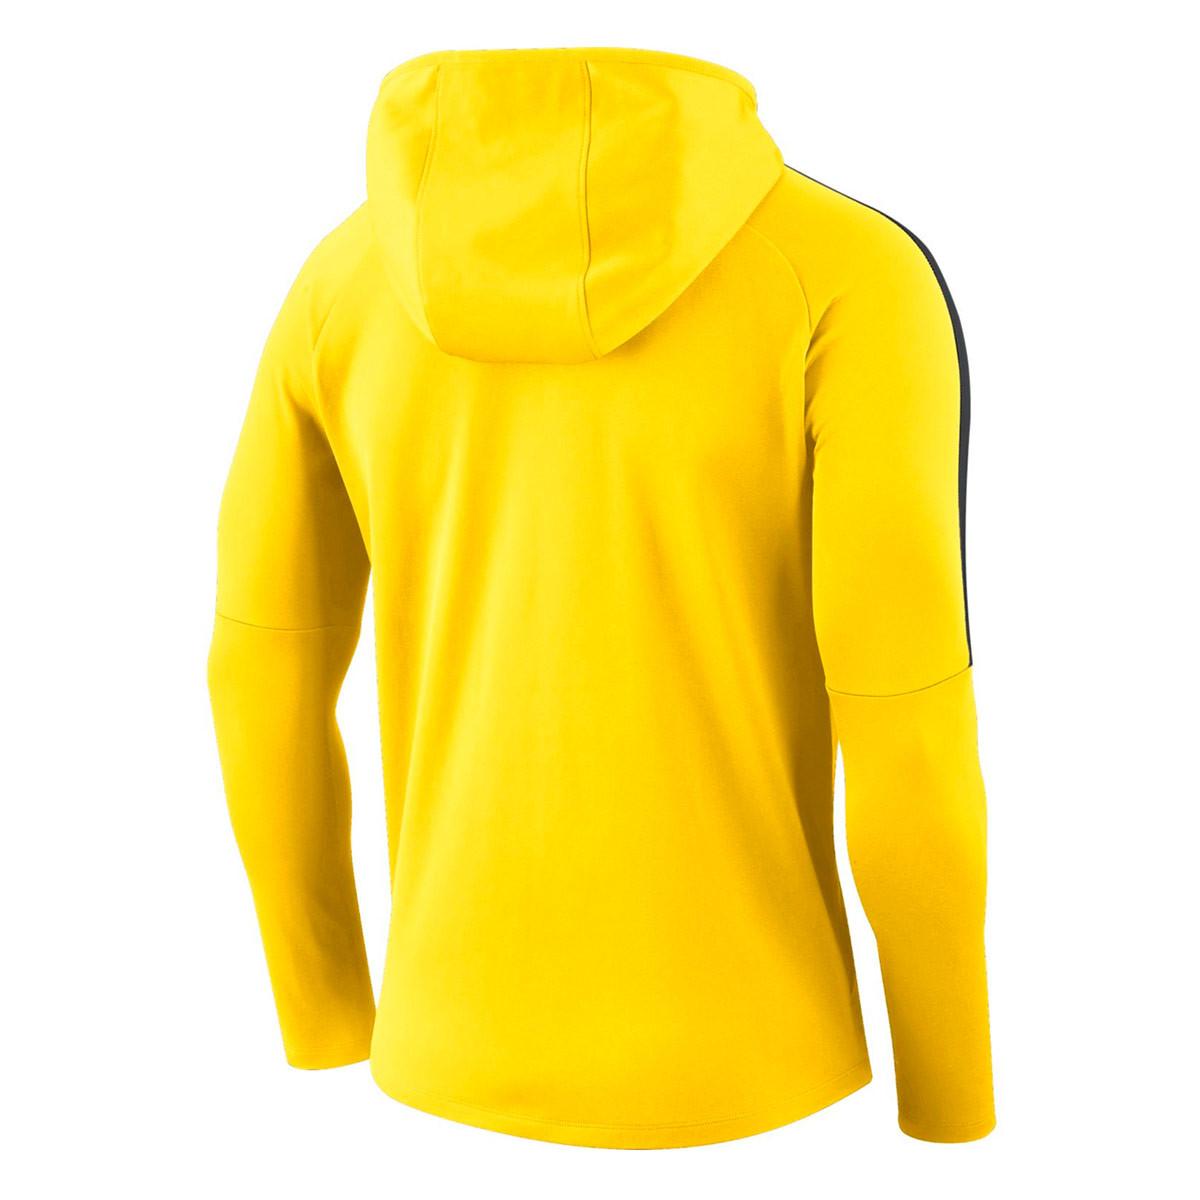 22aec07d5 Sweatshirt Nike Kids Academy 18 Hoodie Tour yellow-Anthracite-Black -  Football store Fútbol Emotion